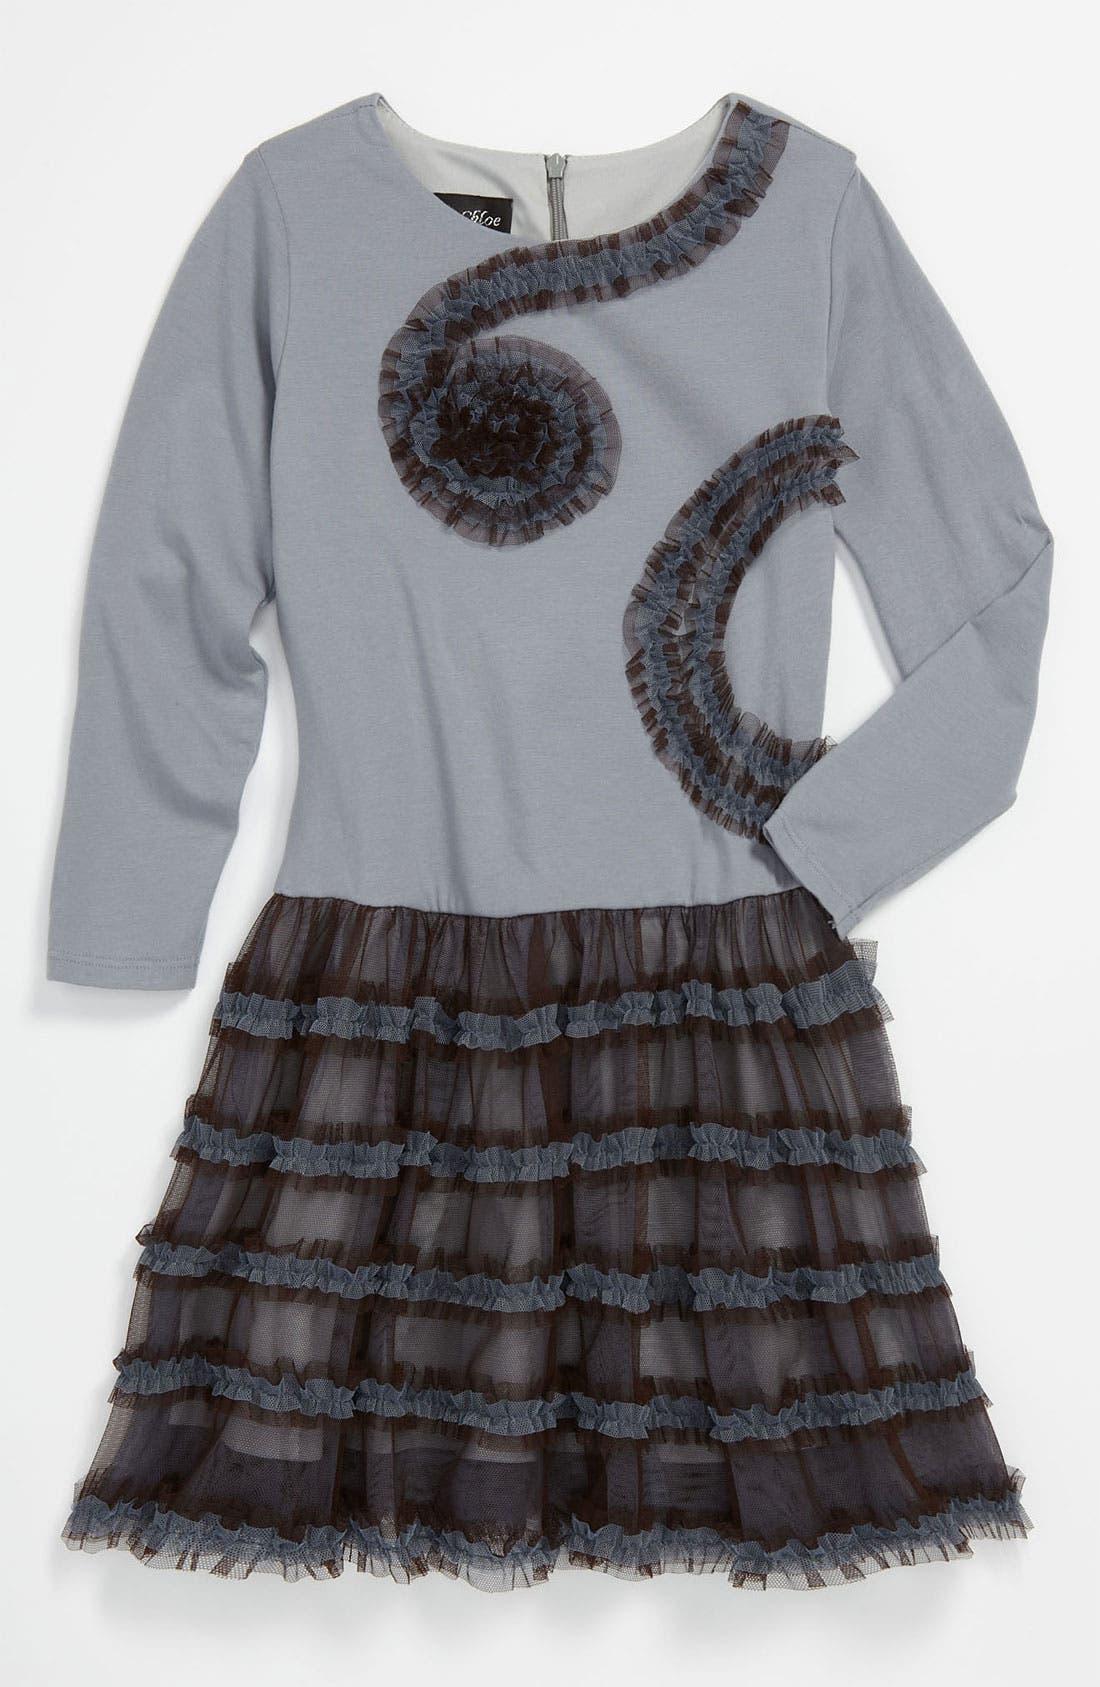 Main Image - Isobella & Chloe 'Blue Moon' Mesh Ruffle Dress (Little Girls & Big Girls)